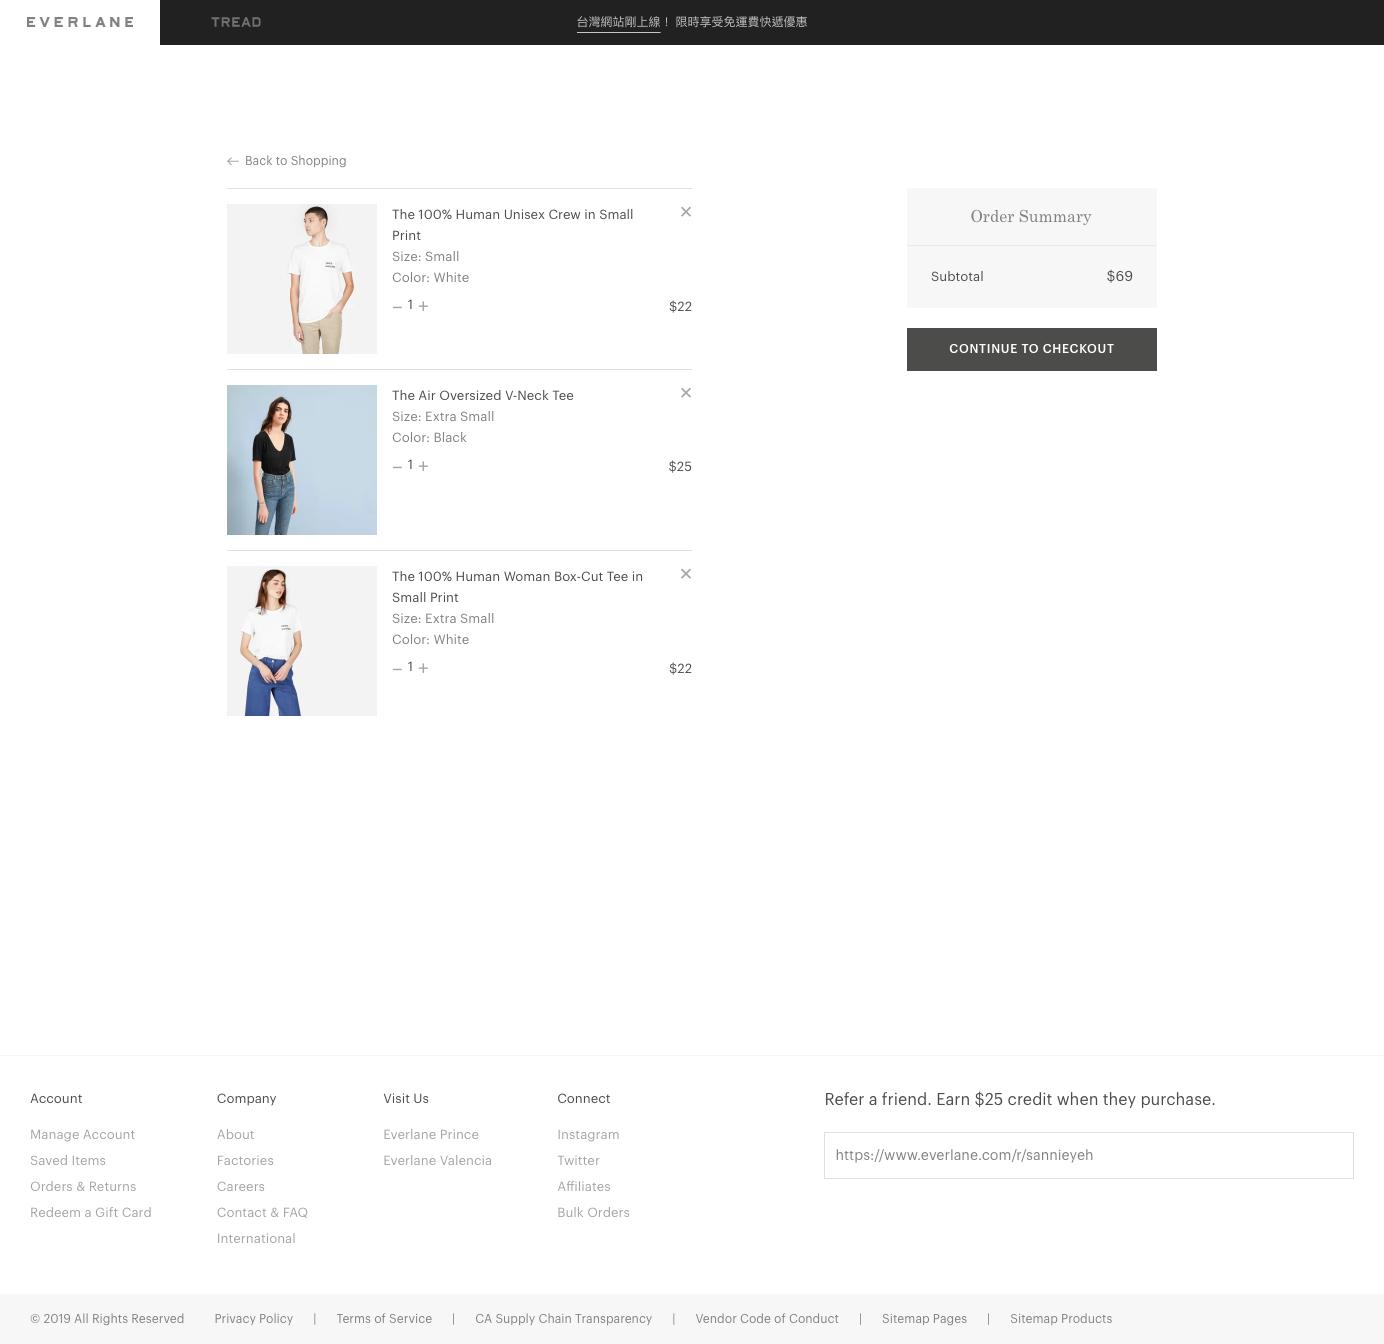 screenshot-www.everlane.com-2019.07.22-13-14-16.png